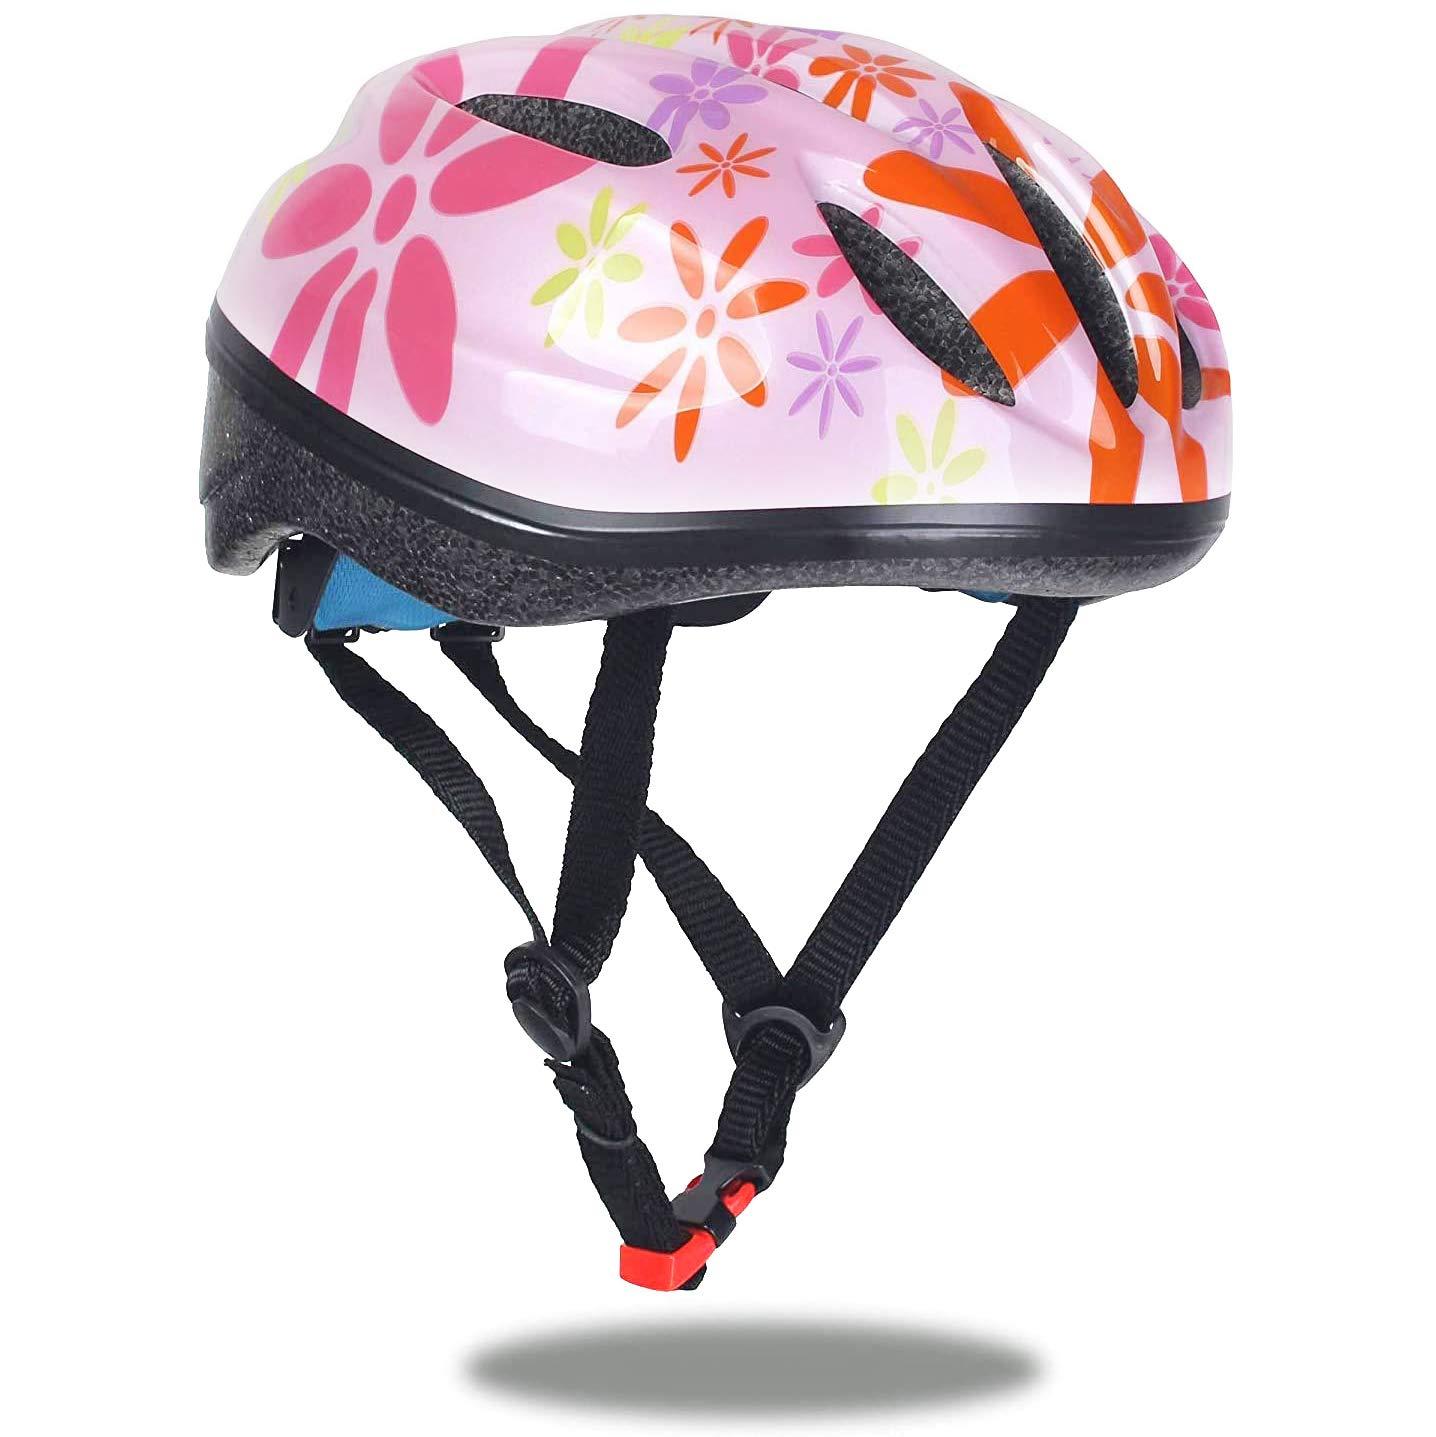 Dostar Toddler Helmet Child CPSC Certified Kids Bike Helmet Youth Boys/Girls Helmet Adjustable Multi-Sport Safety Cycling Skateboard Scooter Inline Skating Protective Gear(S/M)